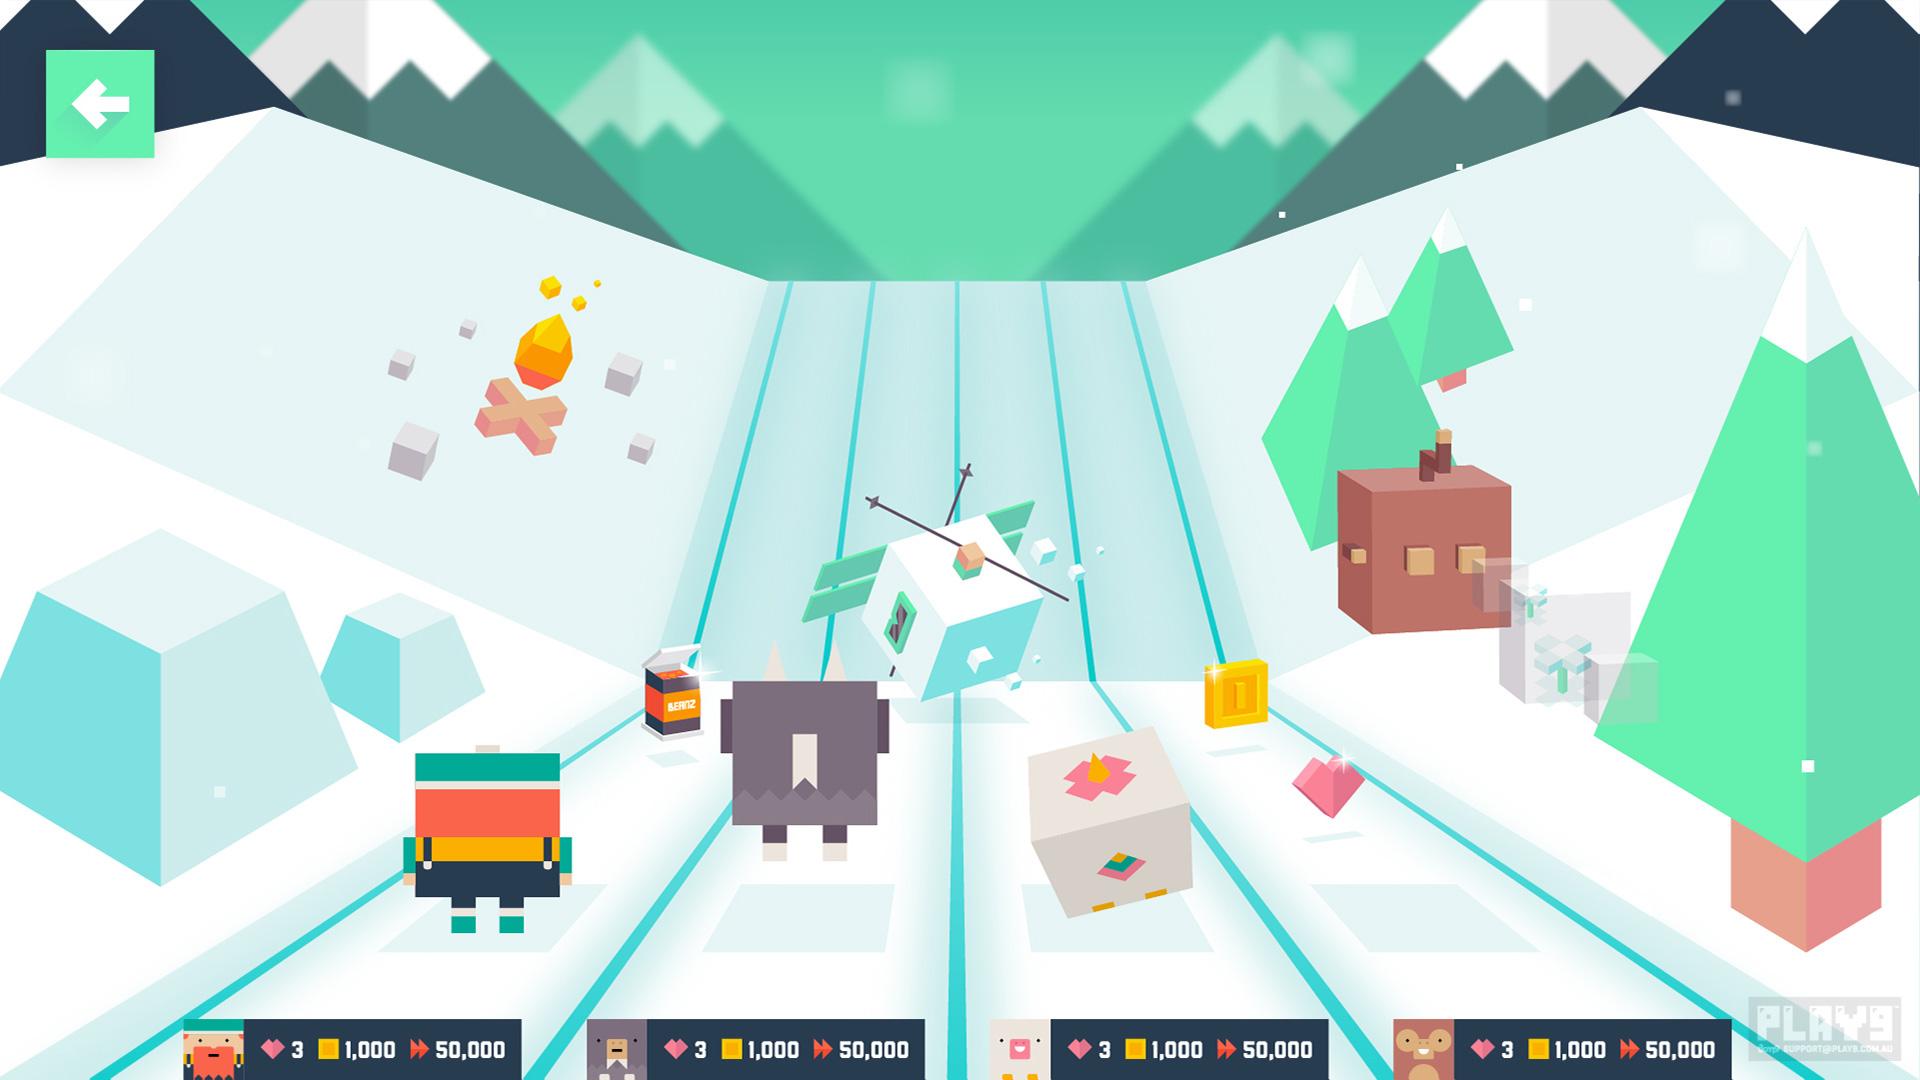 Adventure_Steve_marathon_mountain_gameplay_2.jpg